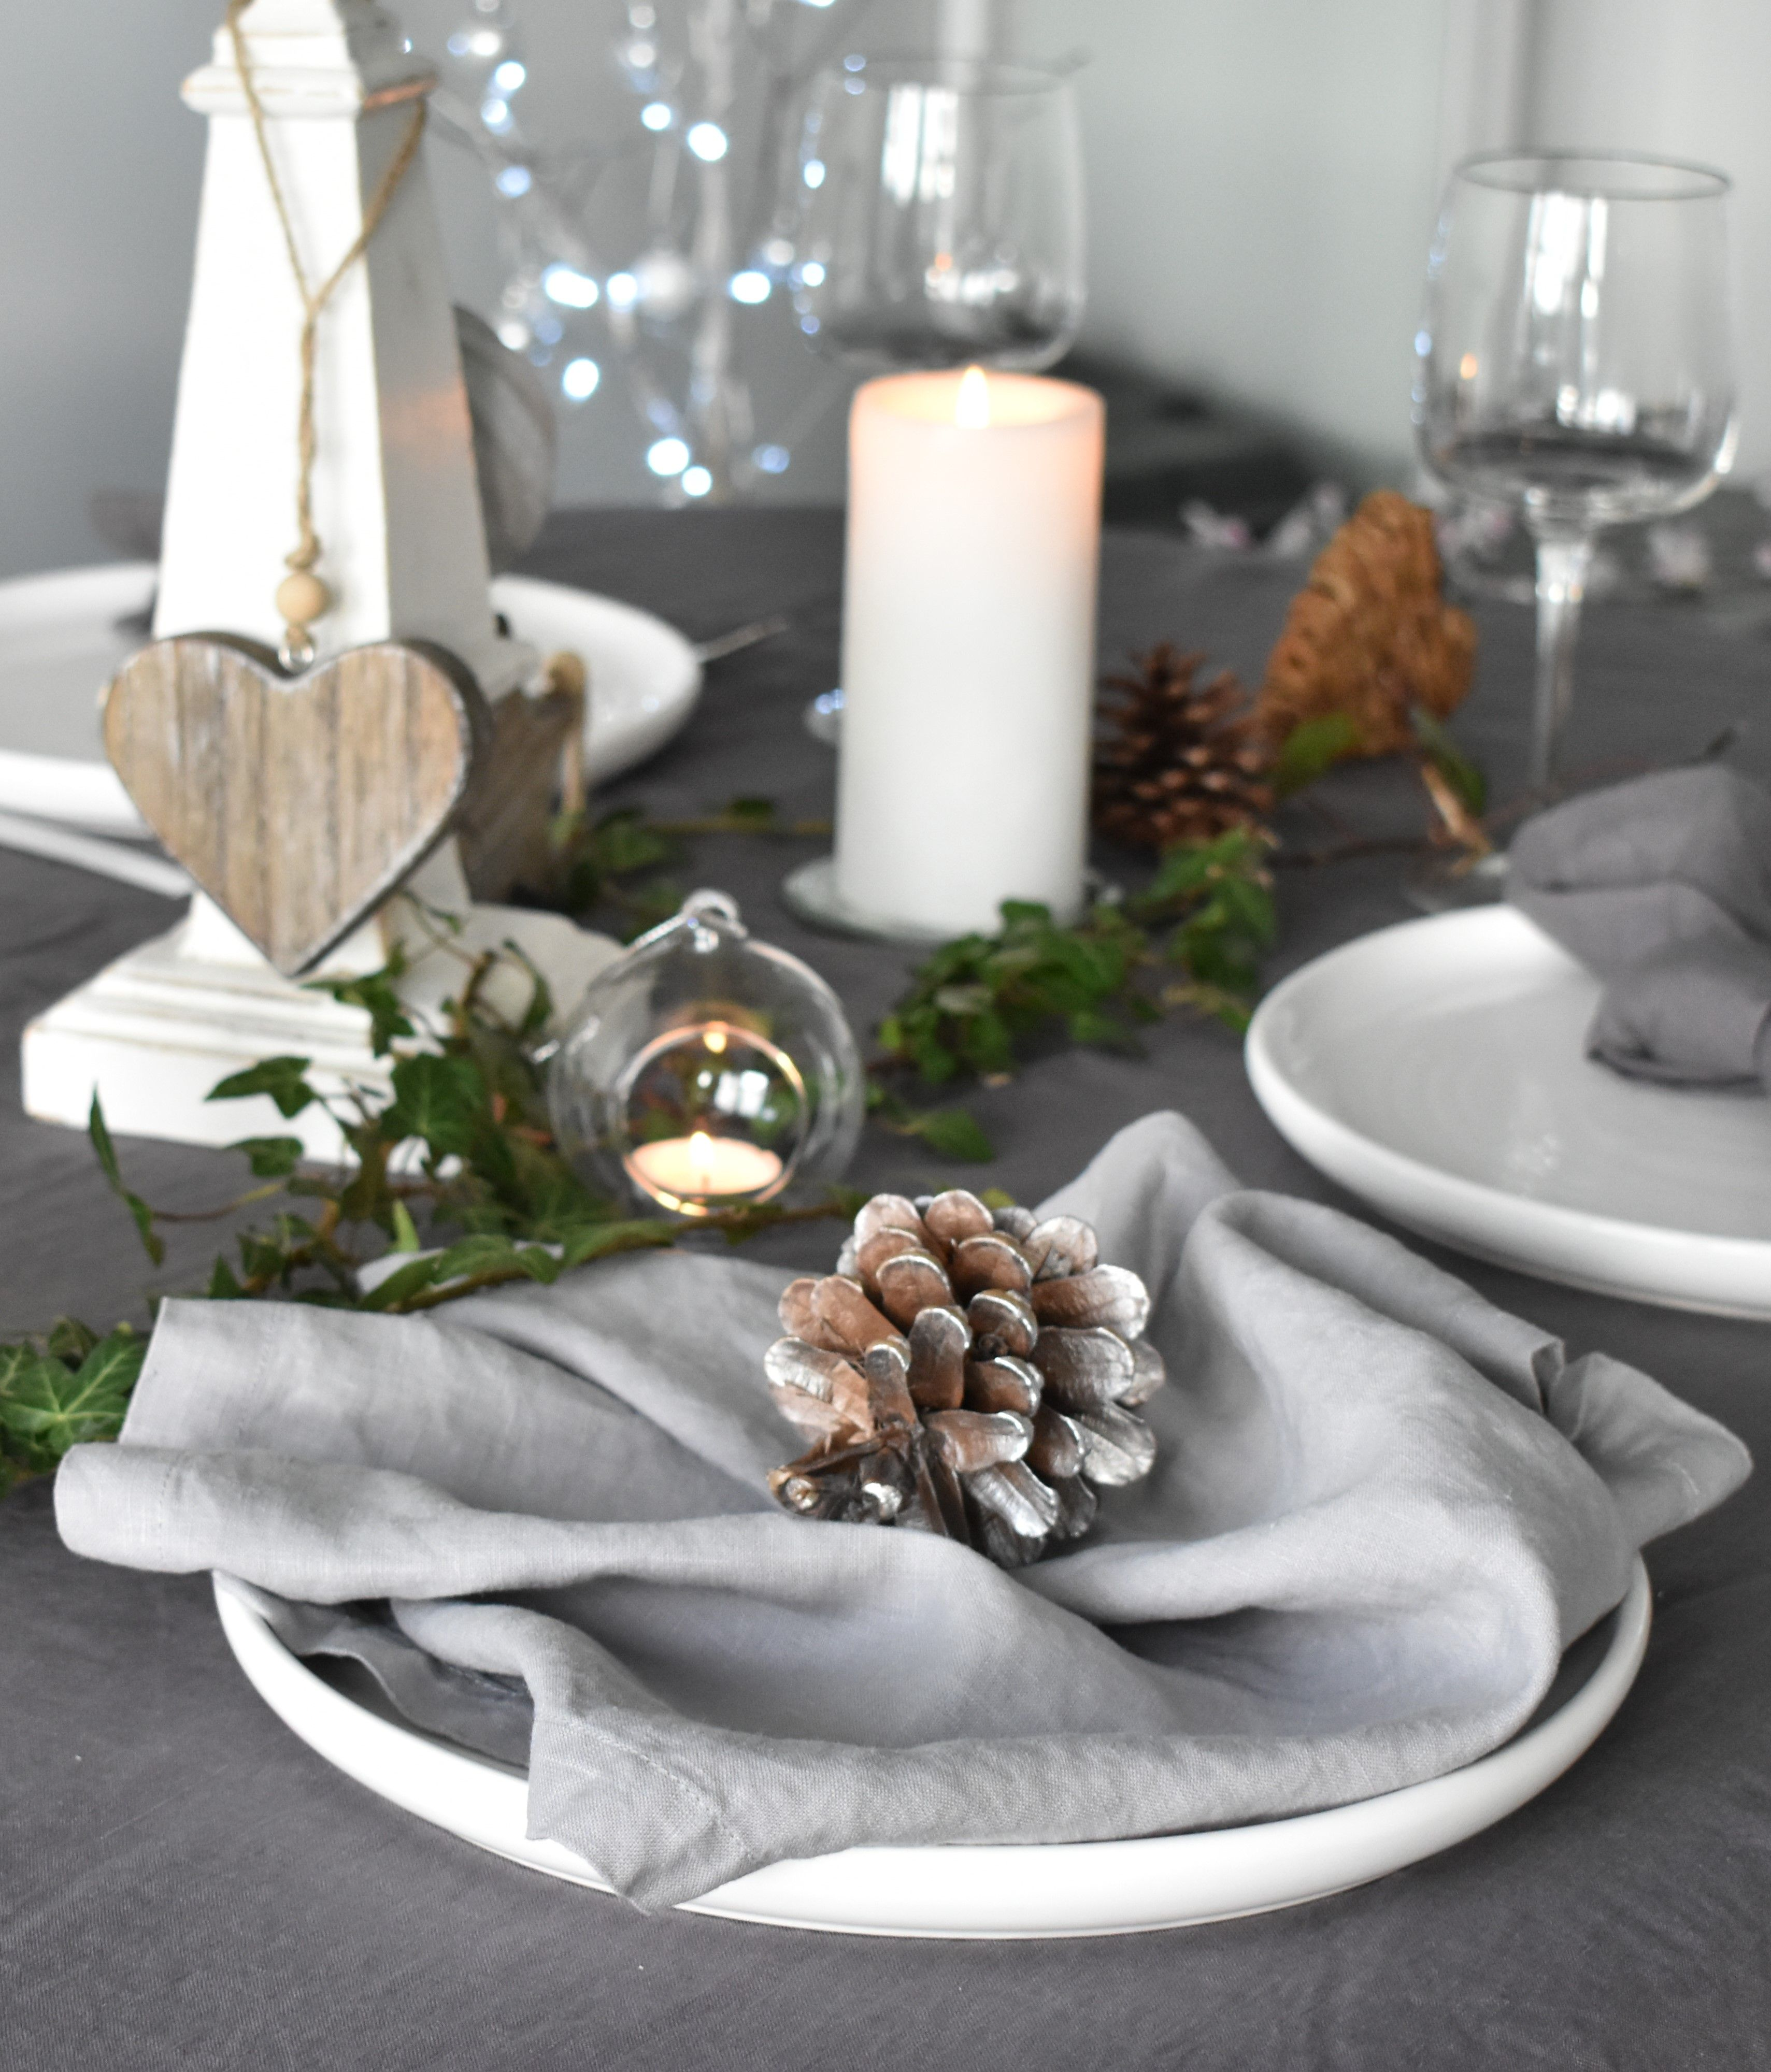 Tumbled Grey Linen Napkin Christmas Table Linen Gray Linen Napkins Christmas Linen Napkins